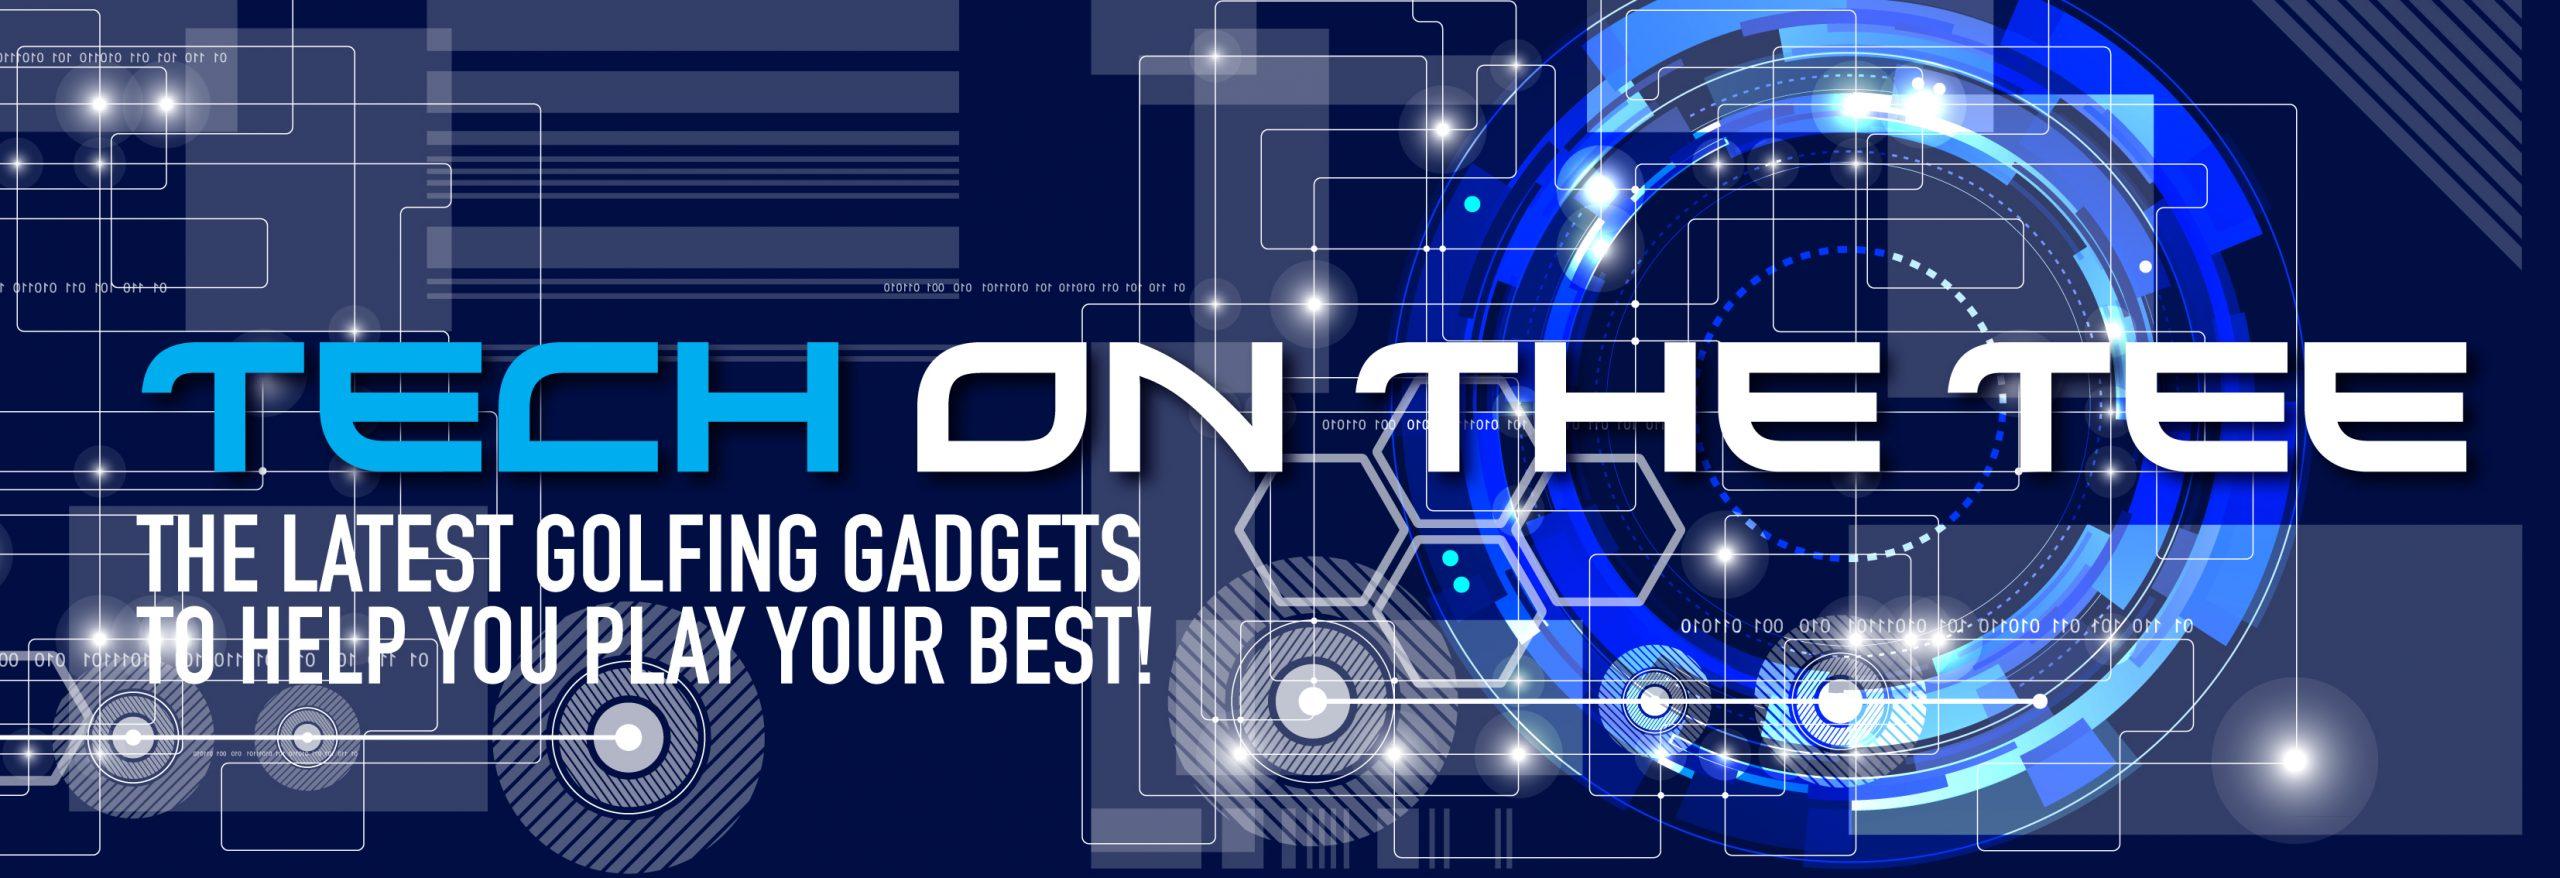 tech-on-the-tee